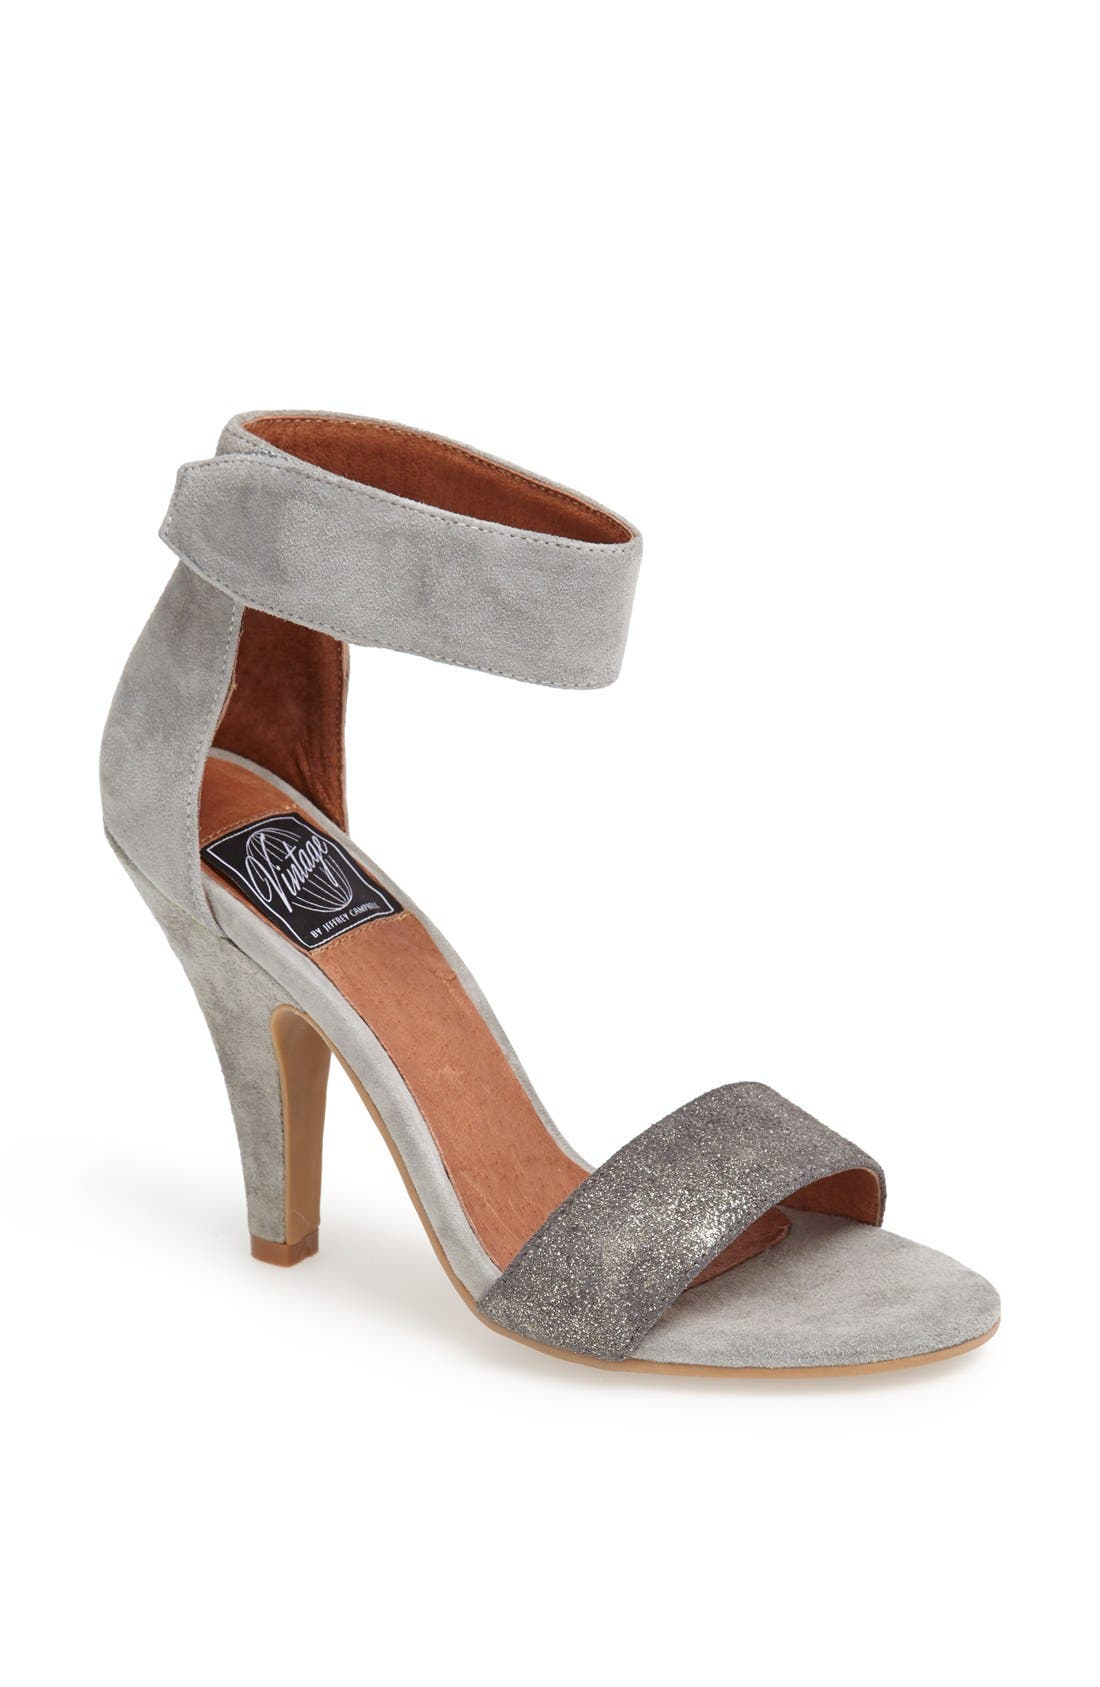 Alternate Image 1 Selected - Jeffrey Campbell 'Foxtrot' Sandal